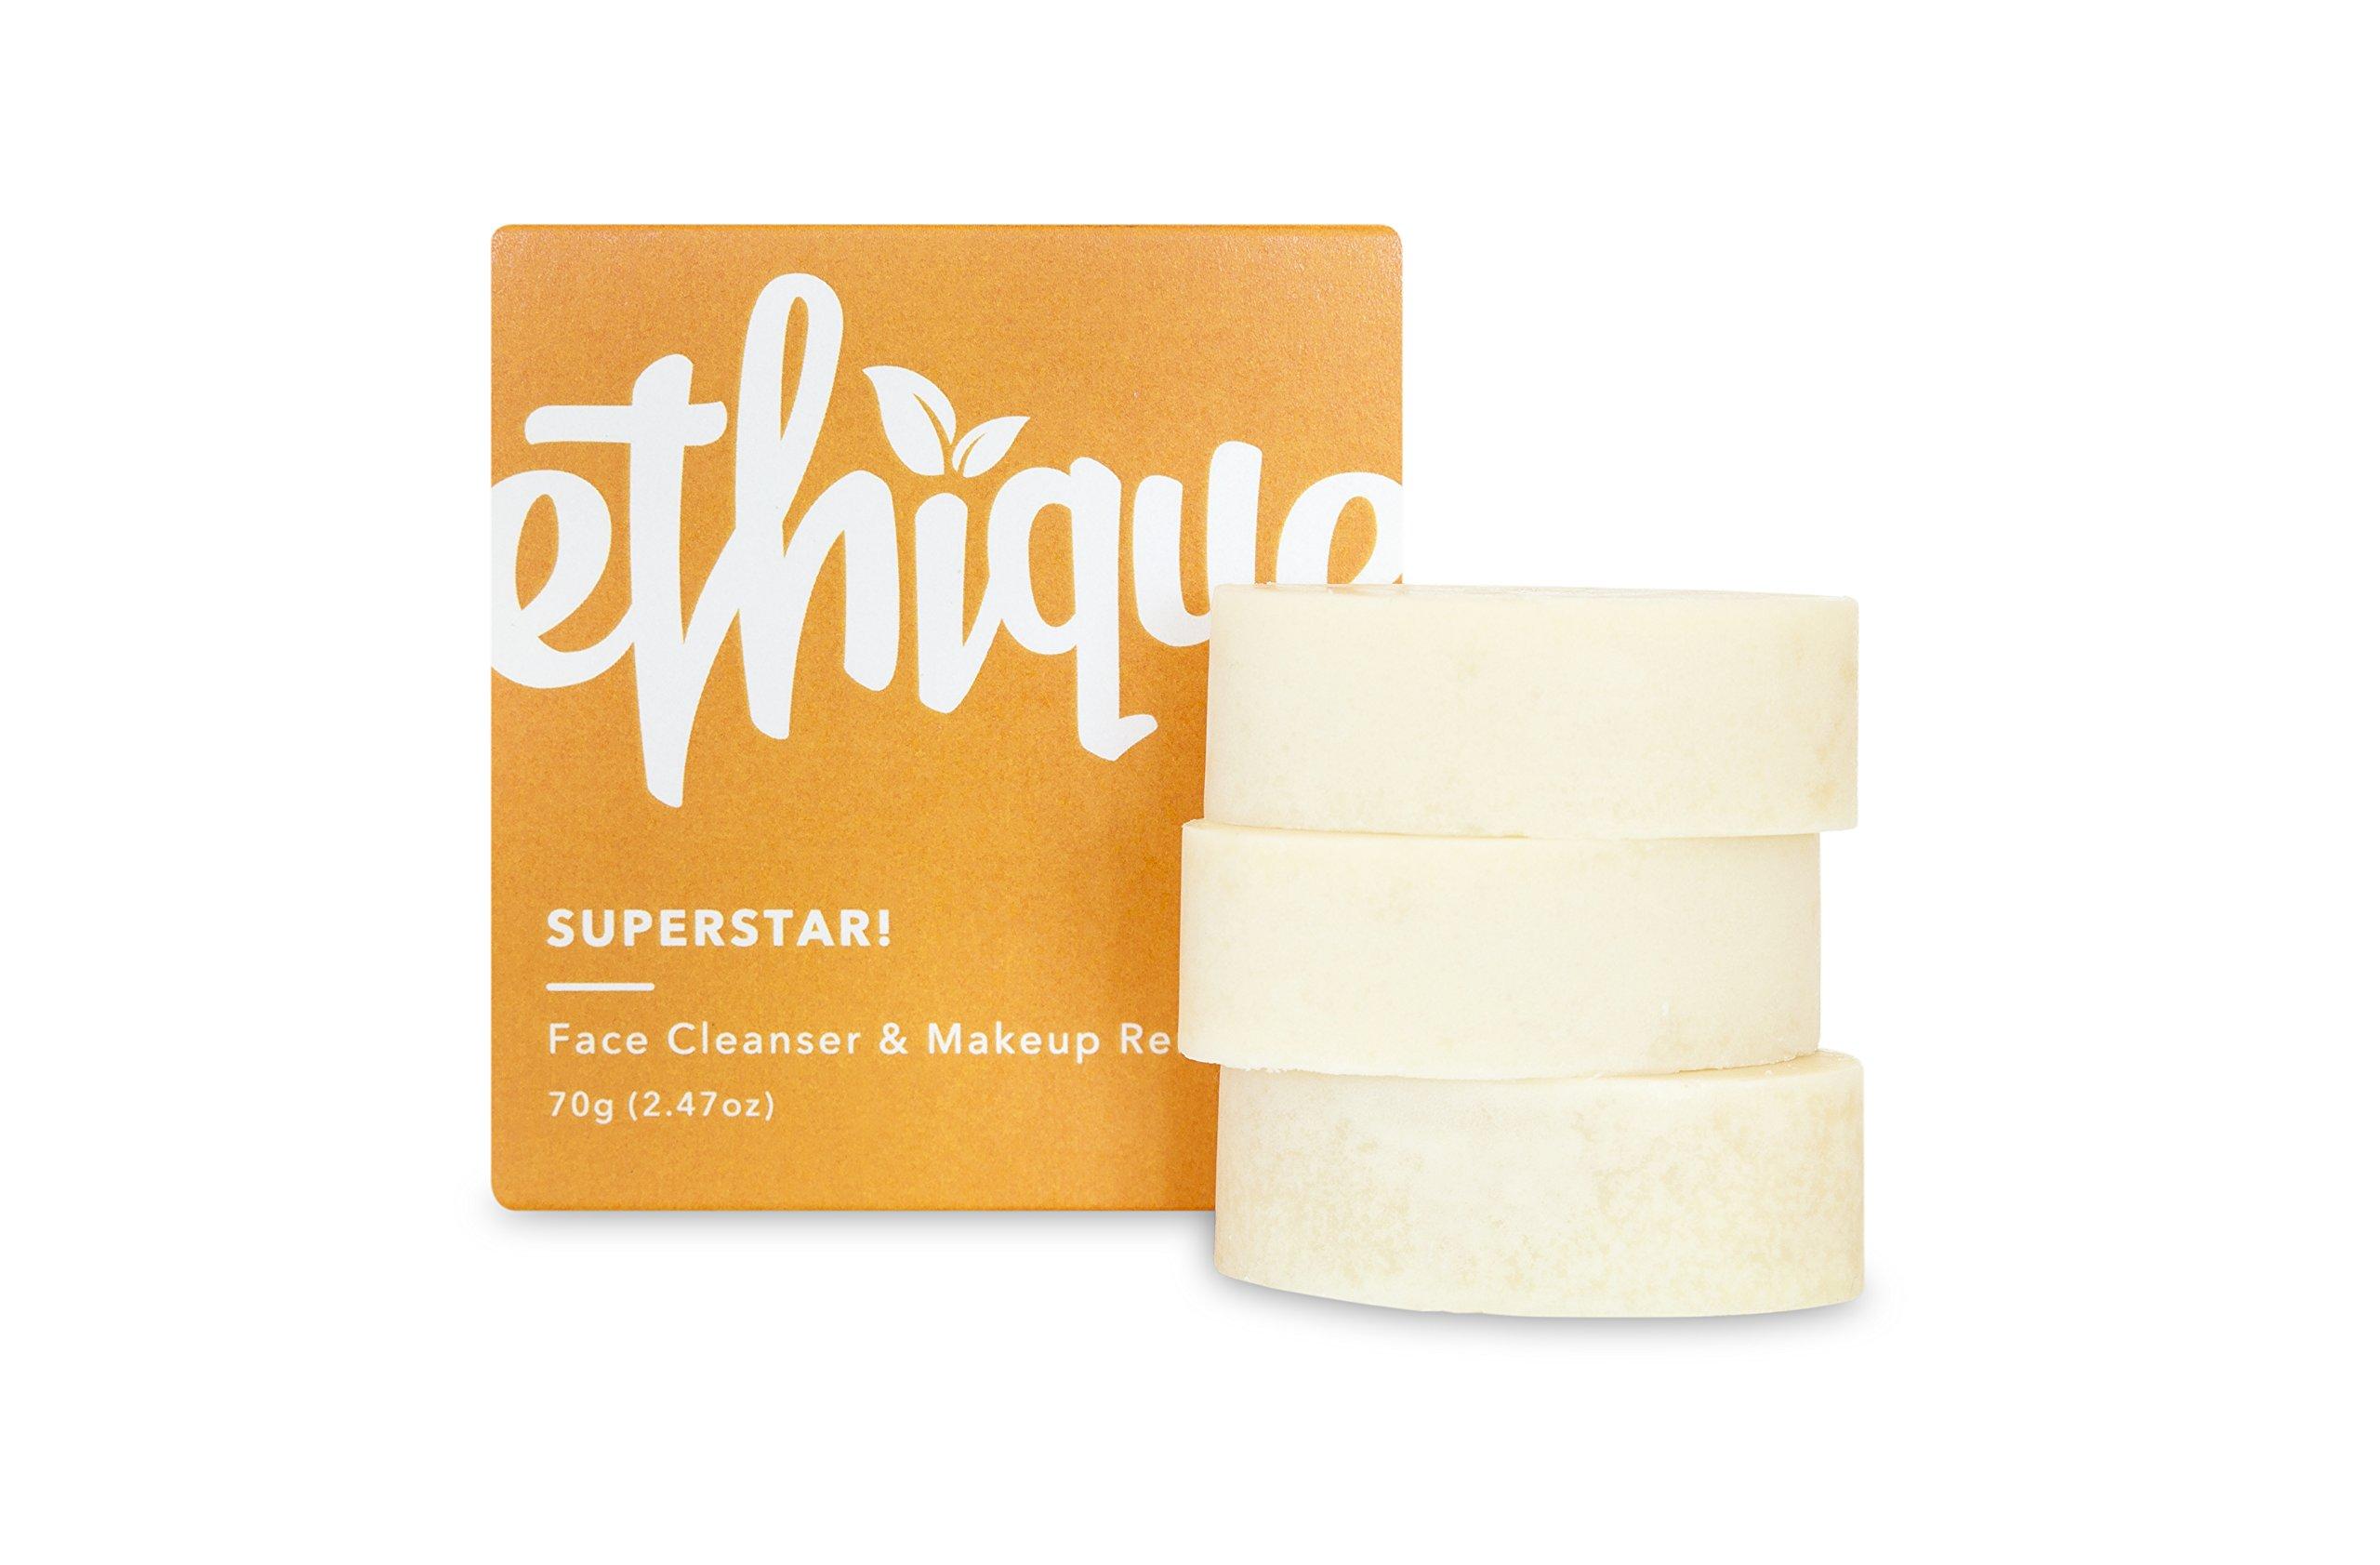 Ethique Face Cleanser & Makeup Remover, SuperStar! 2.47 oz by Ethique (Image #4)